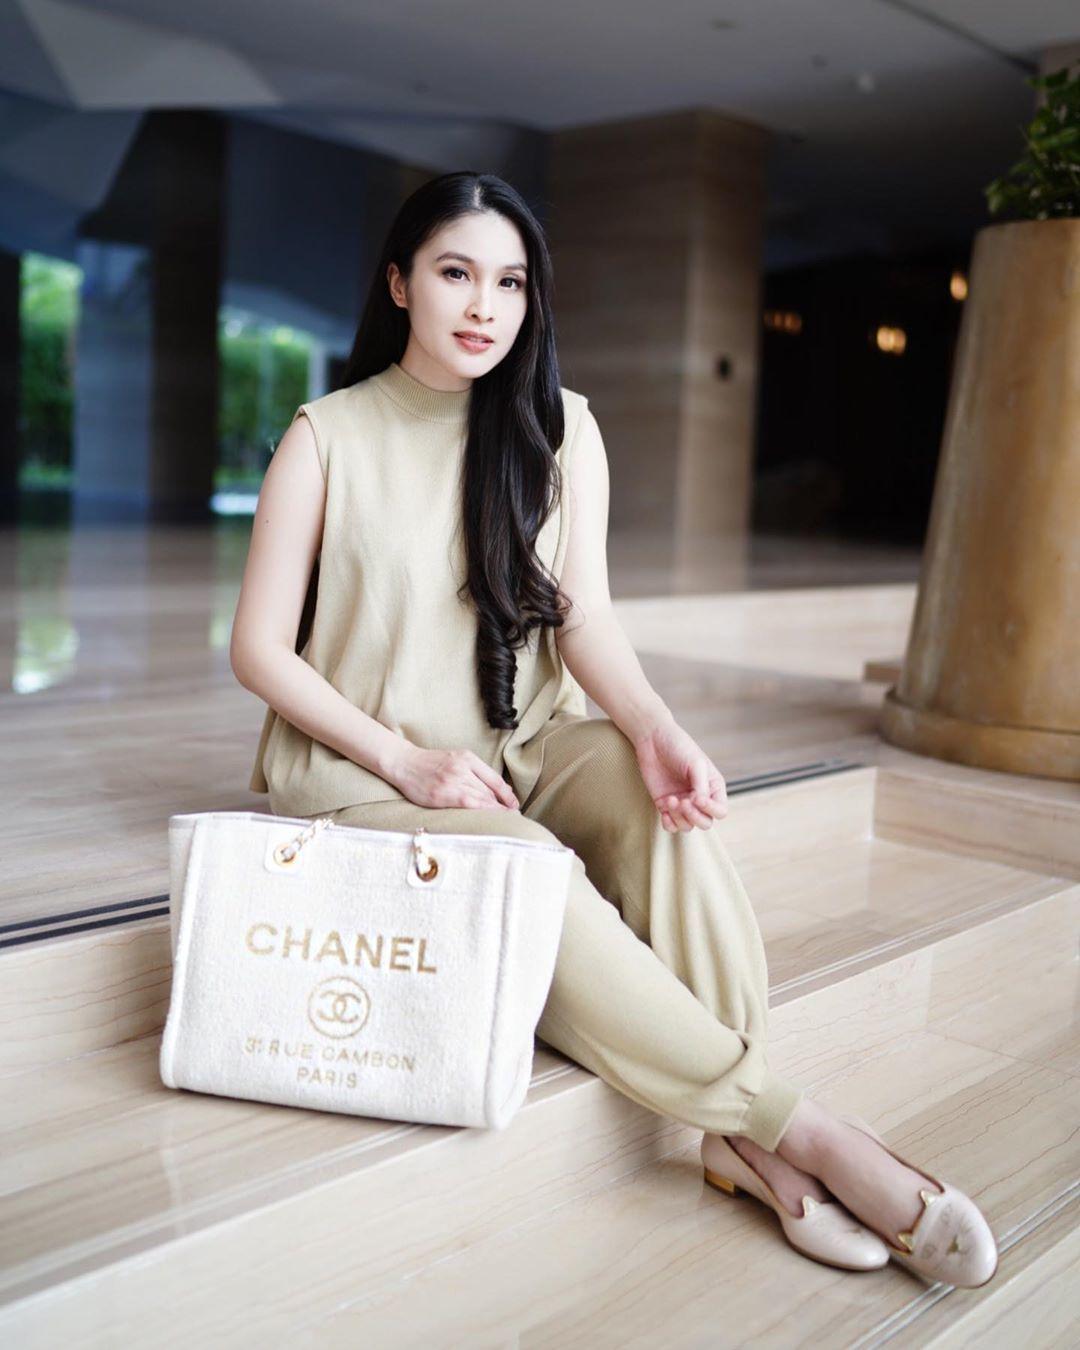 Koleksi Tas Mewah Sandra Dewi yang Harganya Bikin Kaget!